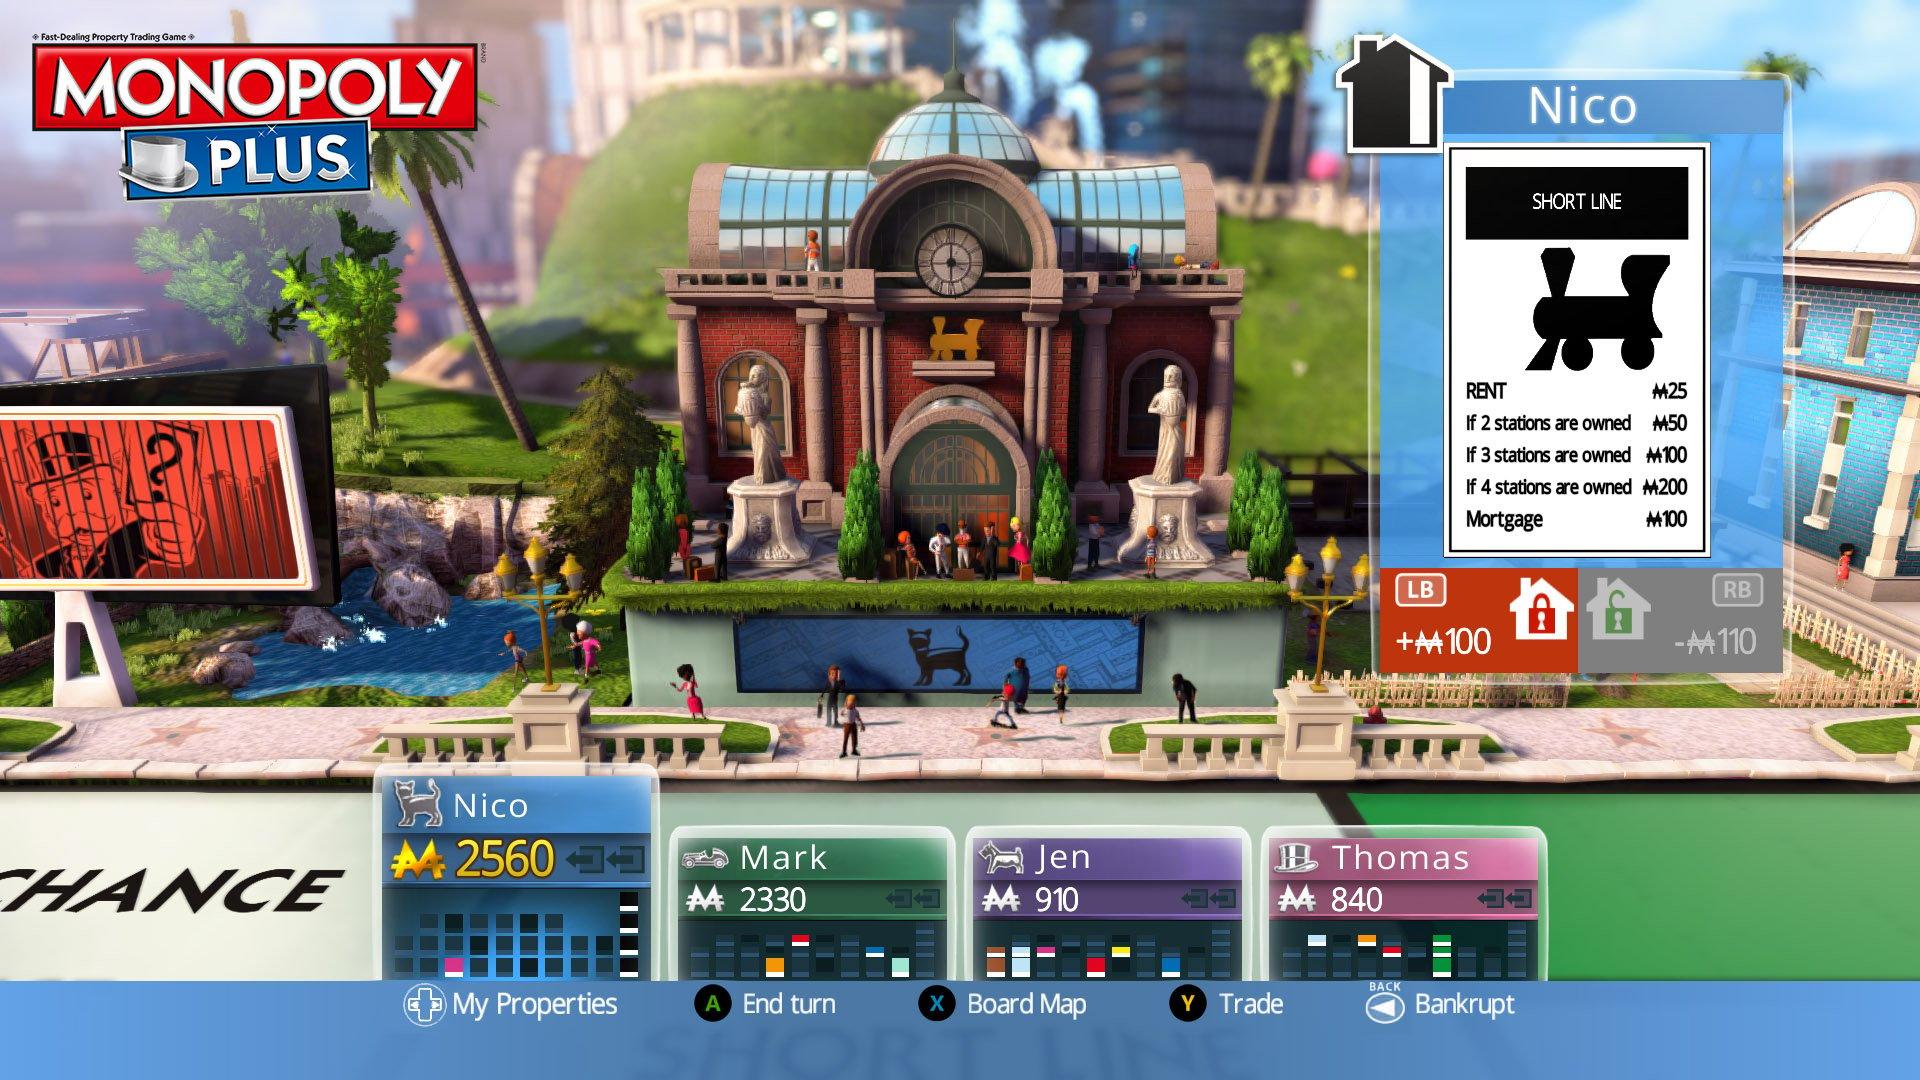 HBG Monopoly Plus Screens 6